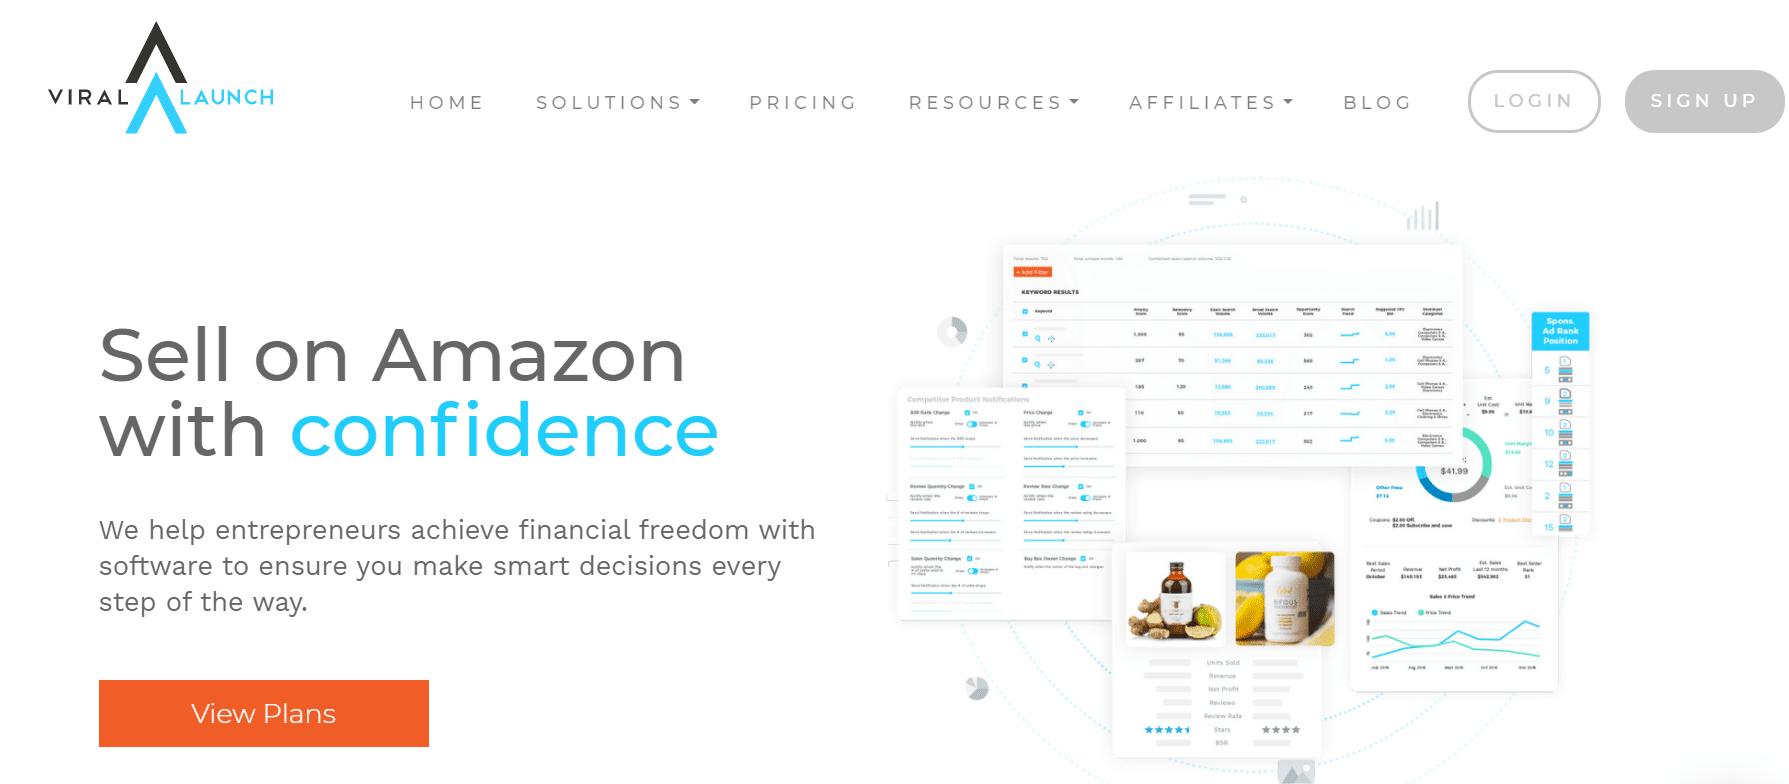 Best Amazon Listing Optimization Tools - viral-launch